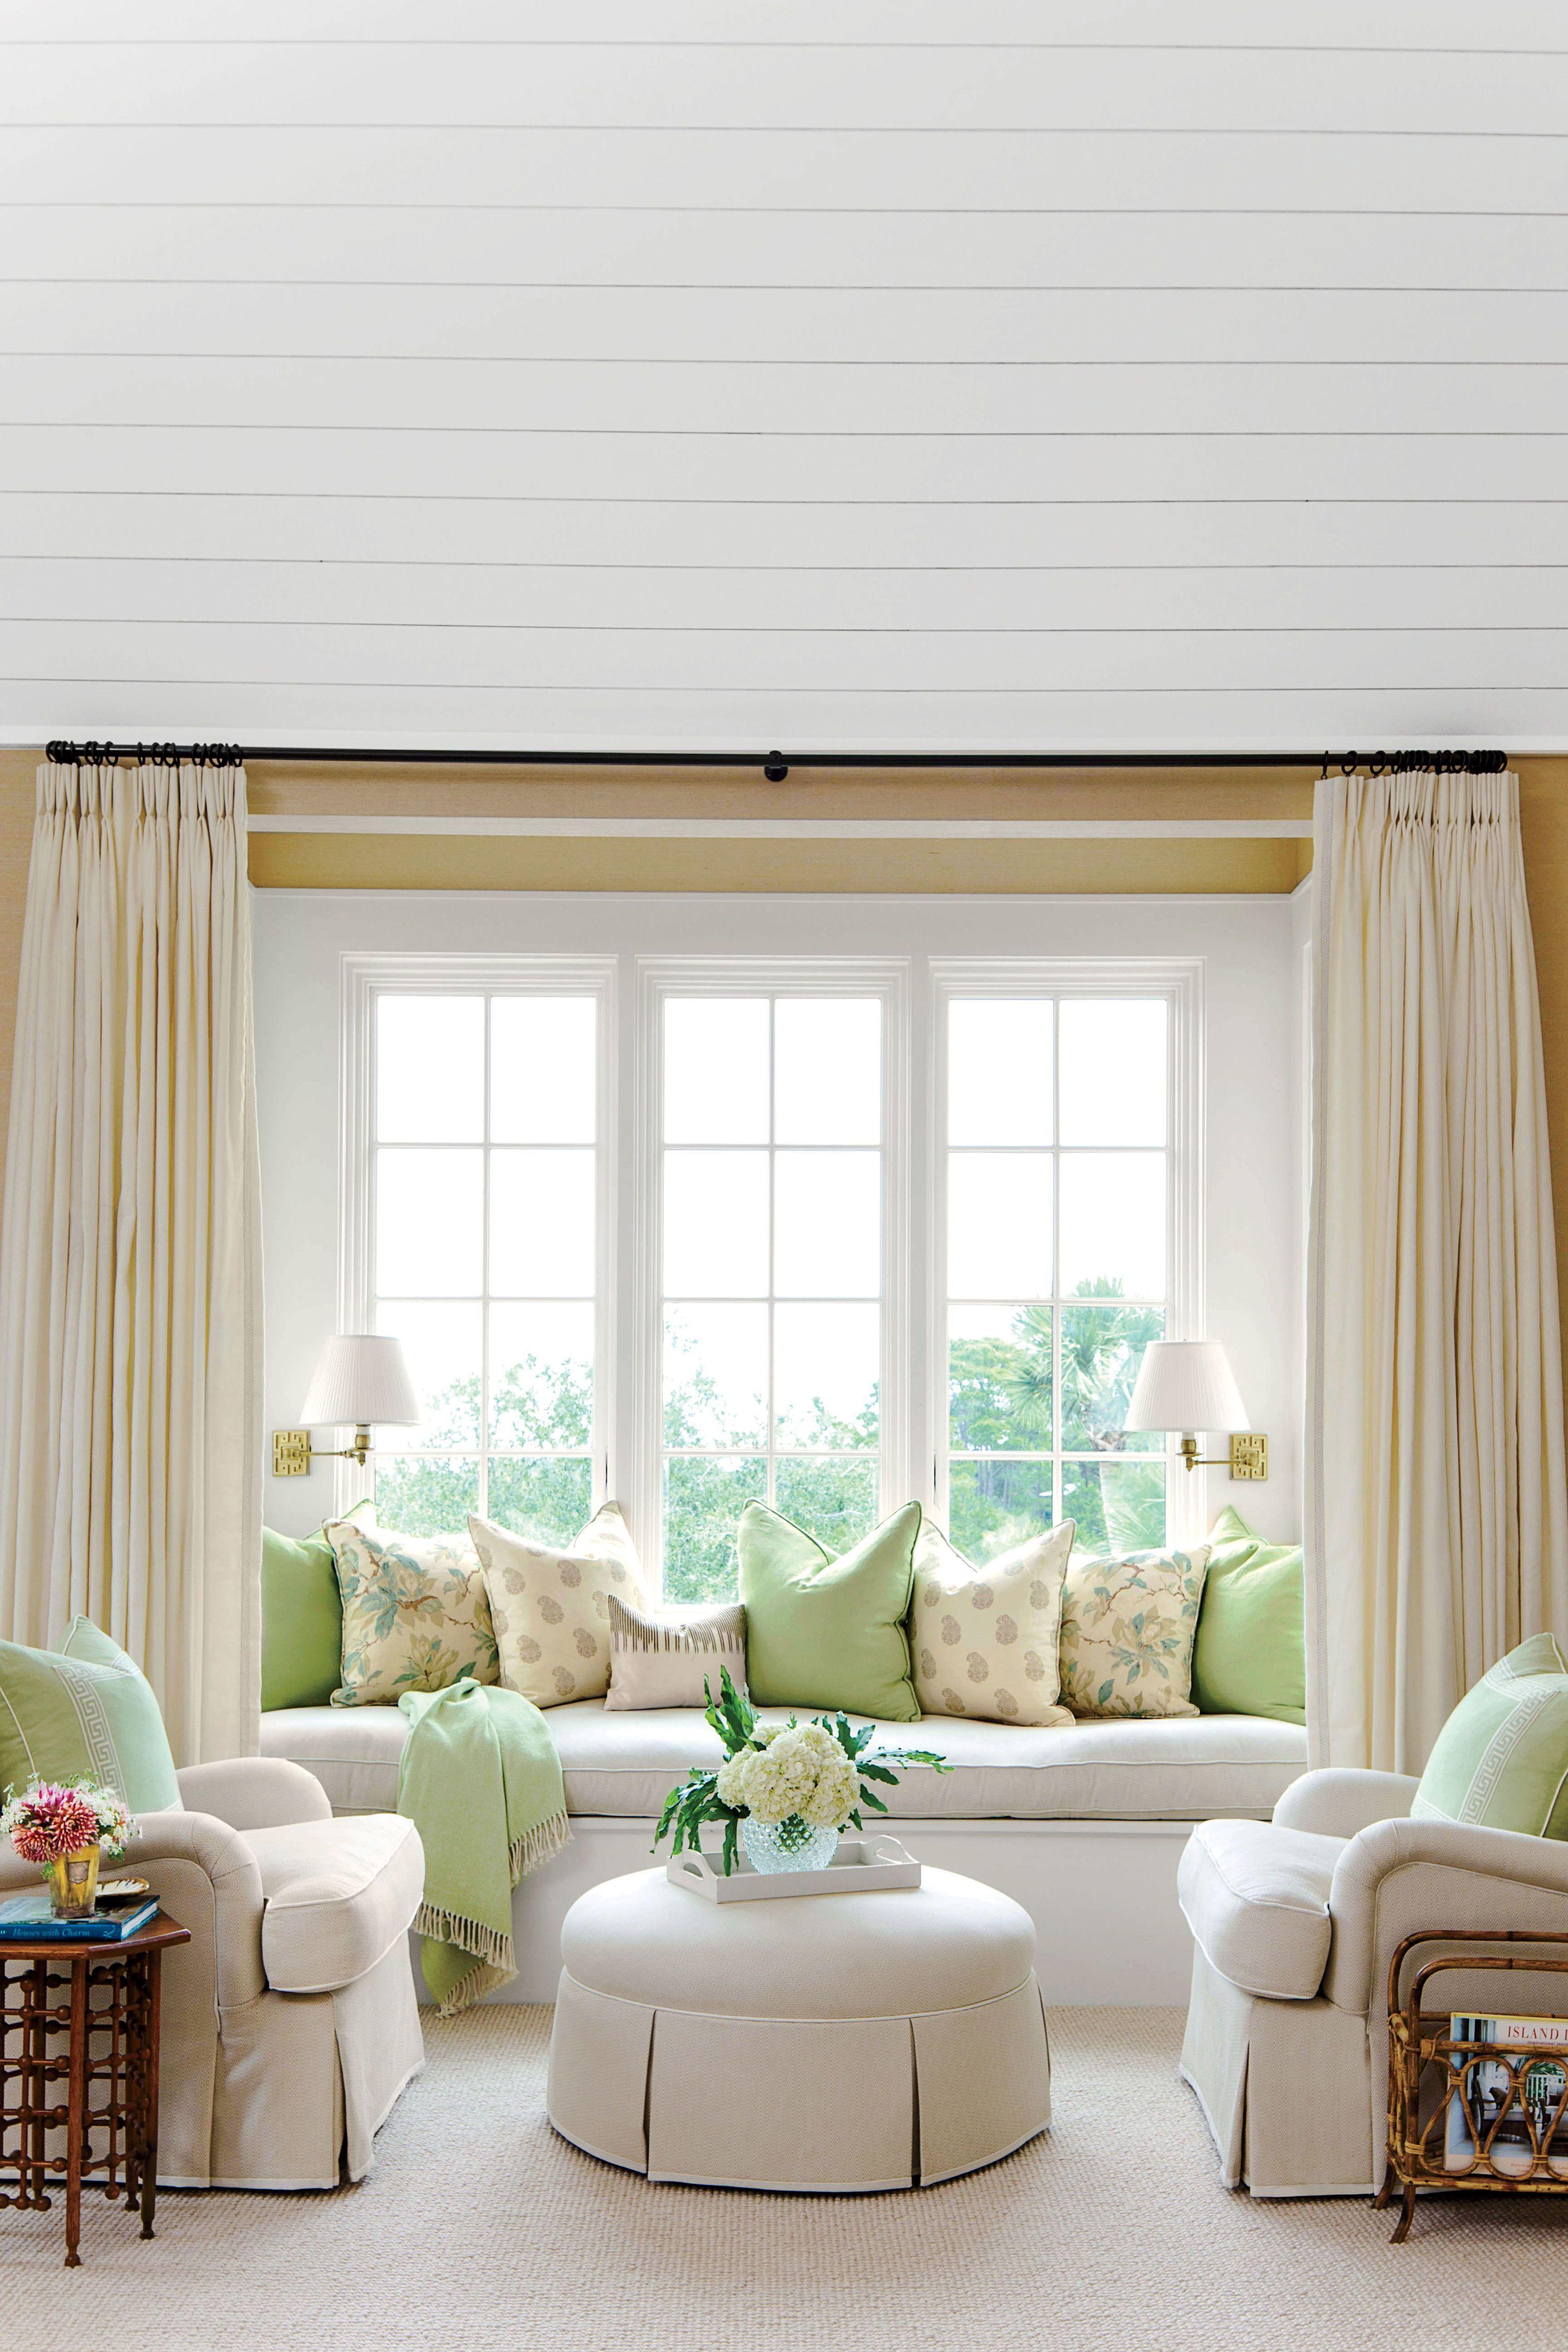 window treatment ideas and curtain designs photos vardagsrum